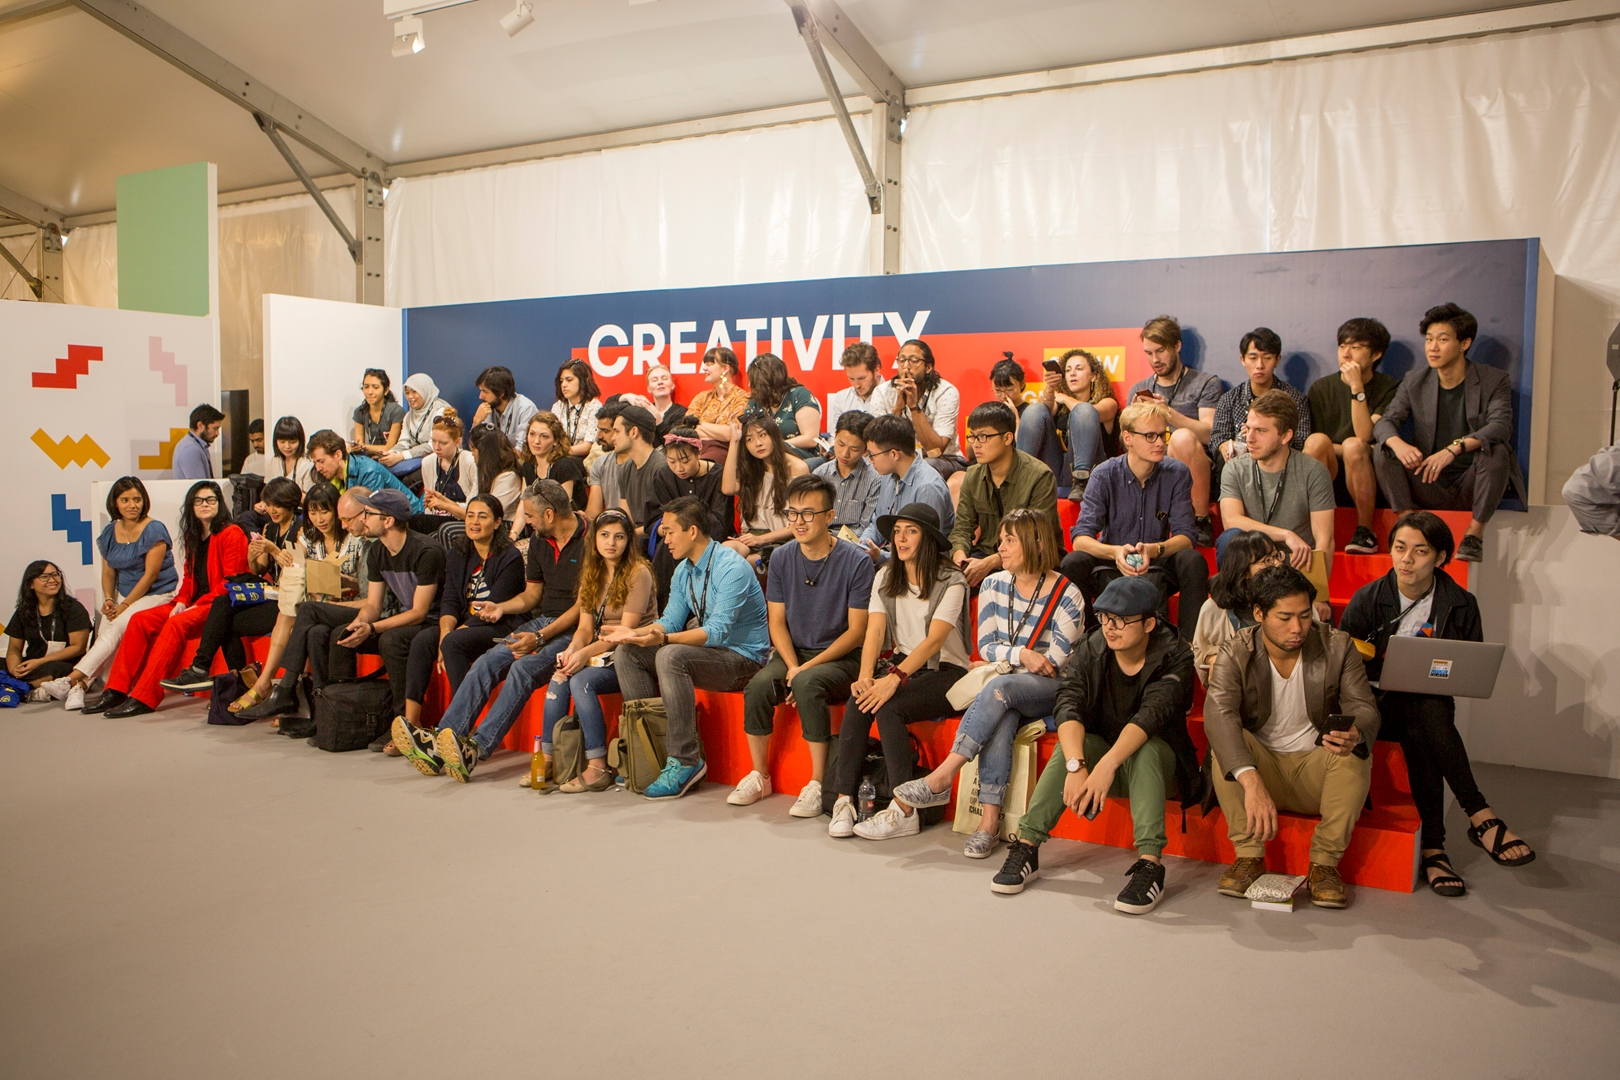 Global Grad Show_Creativity Forum_Dubai Design Week 2017 (Copy)